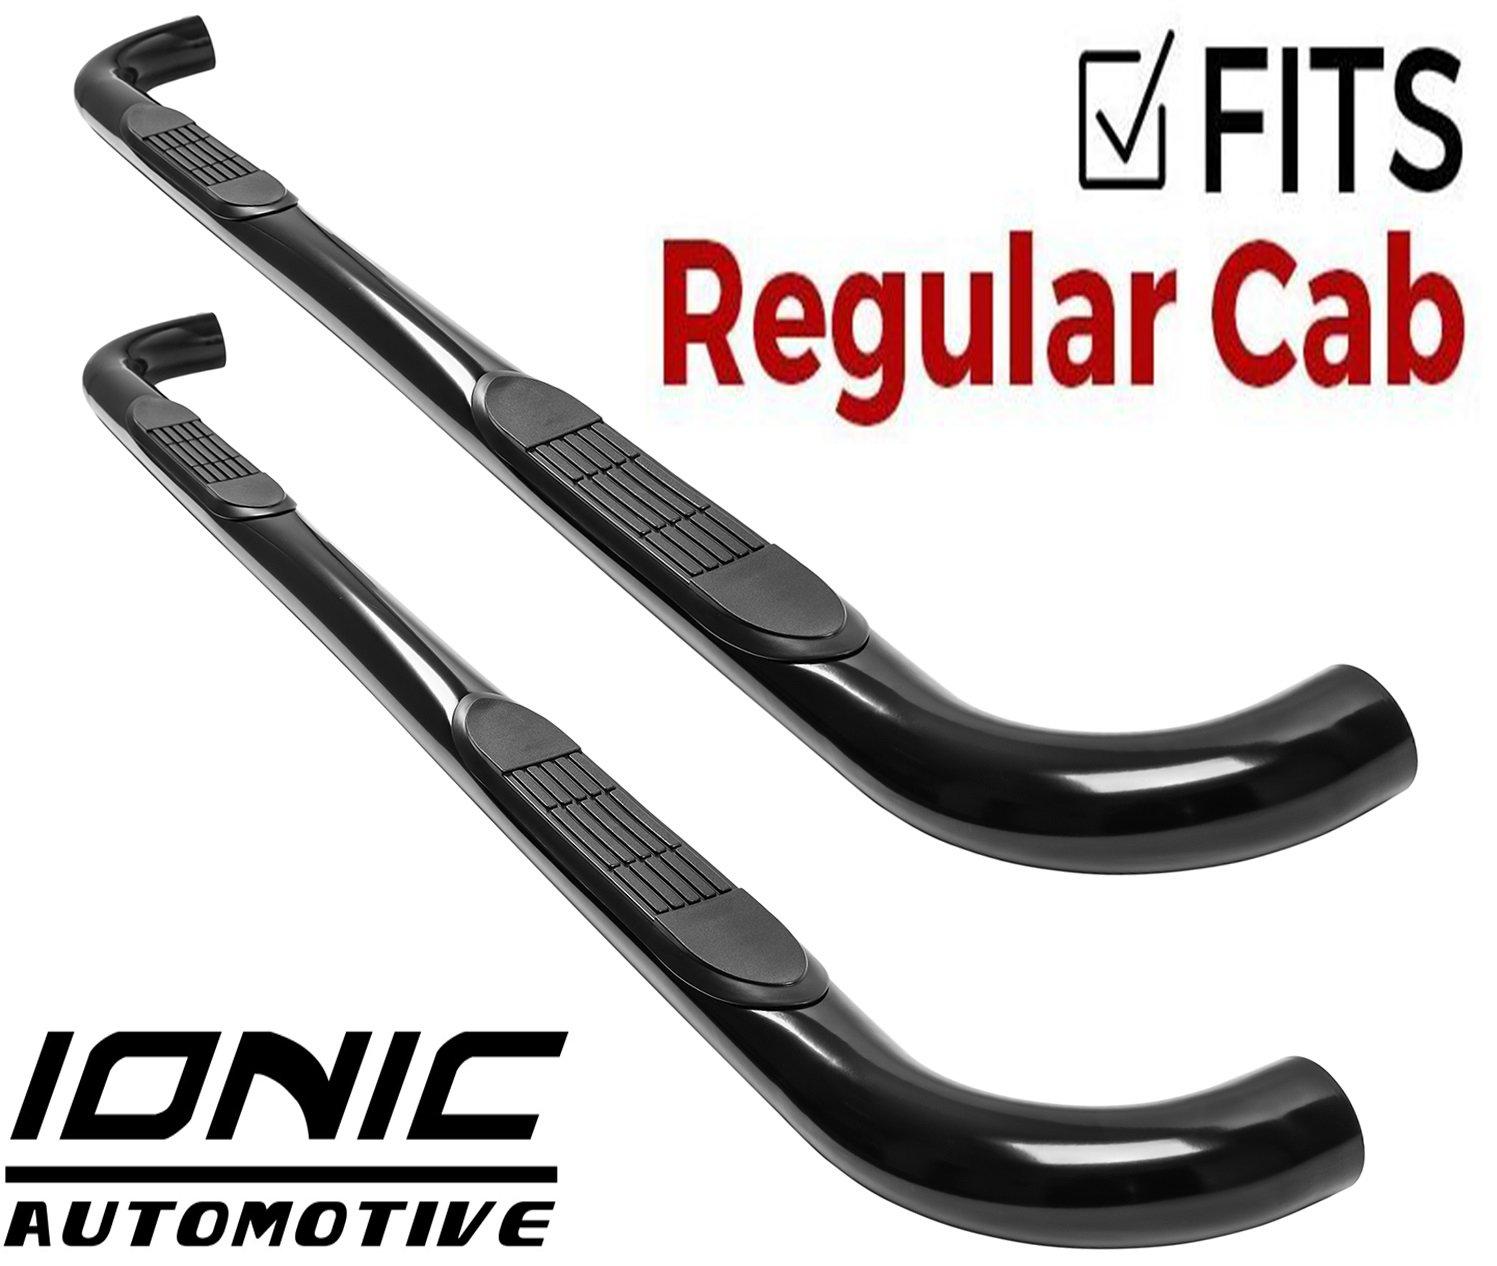 Fits 212470 1999-2016 Ford Super Duty F250 F350 Regular Cab Only Nerf Bars Side Steps Ionic 3 Black